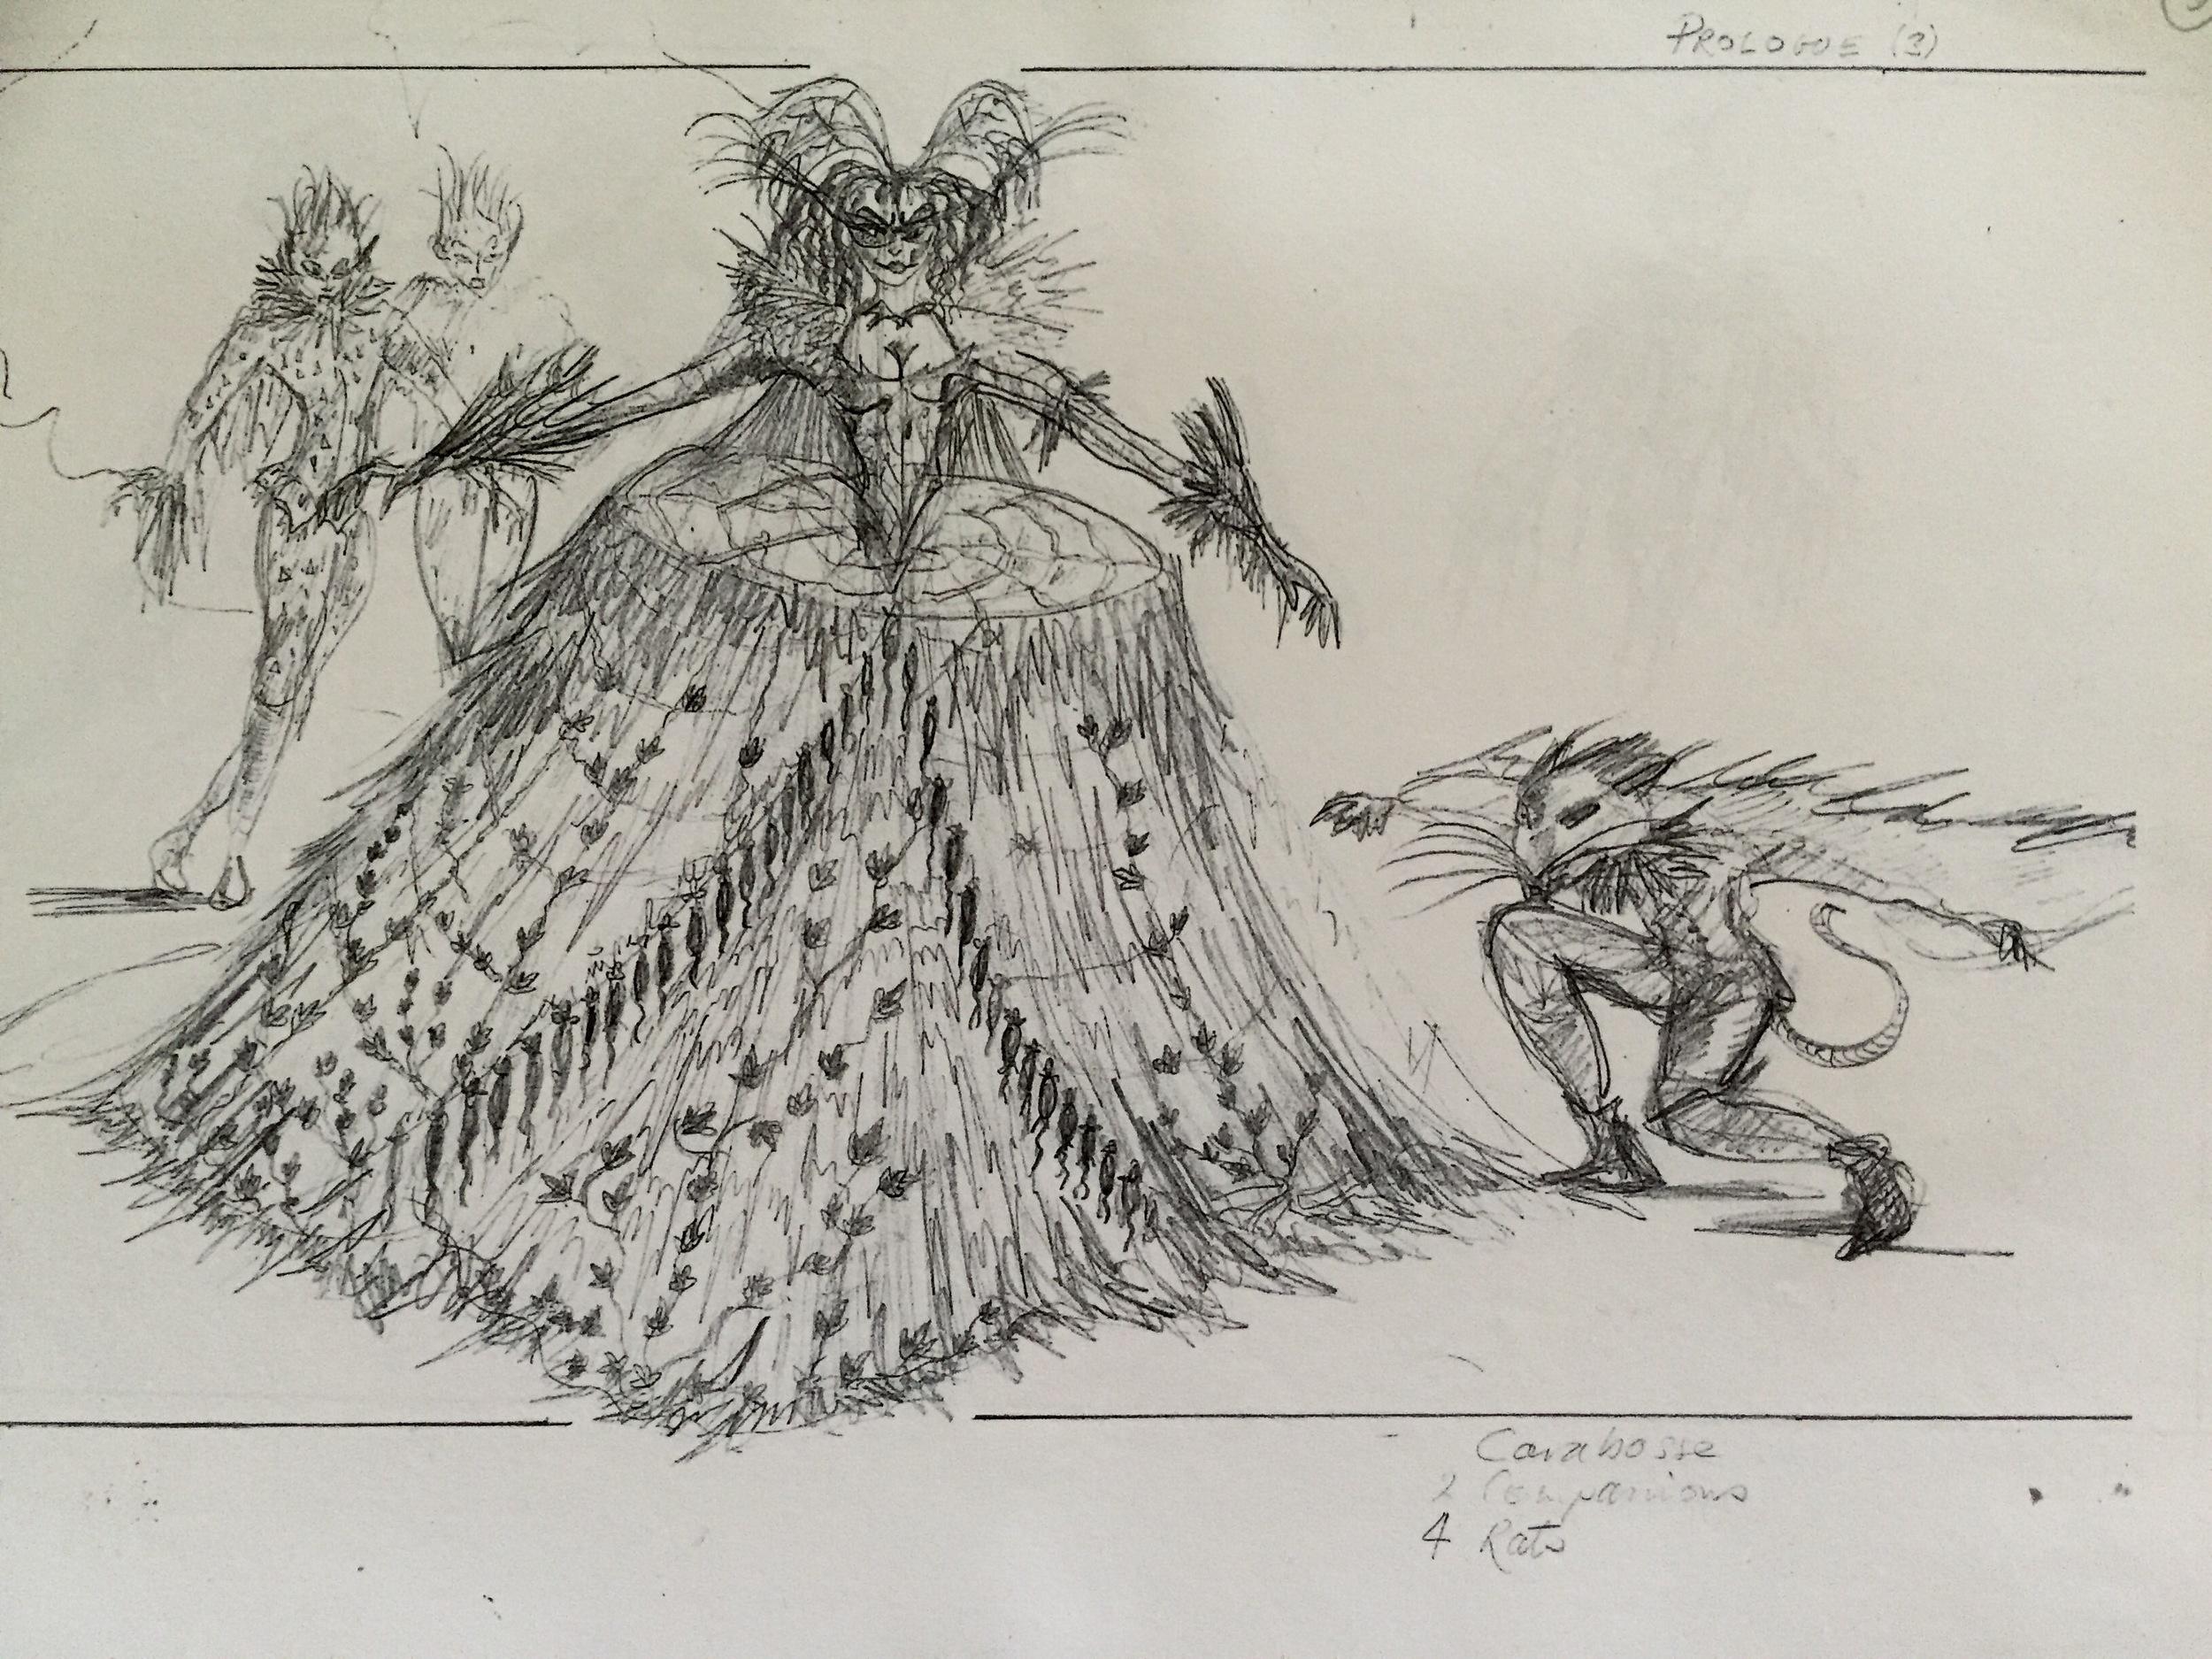 Sleeping Beauty ballet - producction design - David Roger 1.jpg